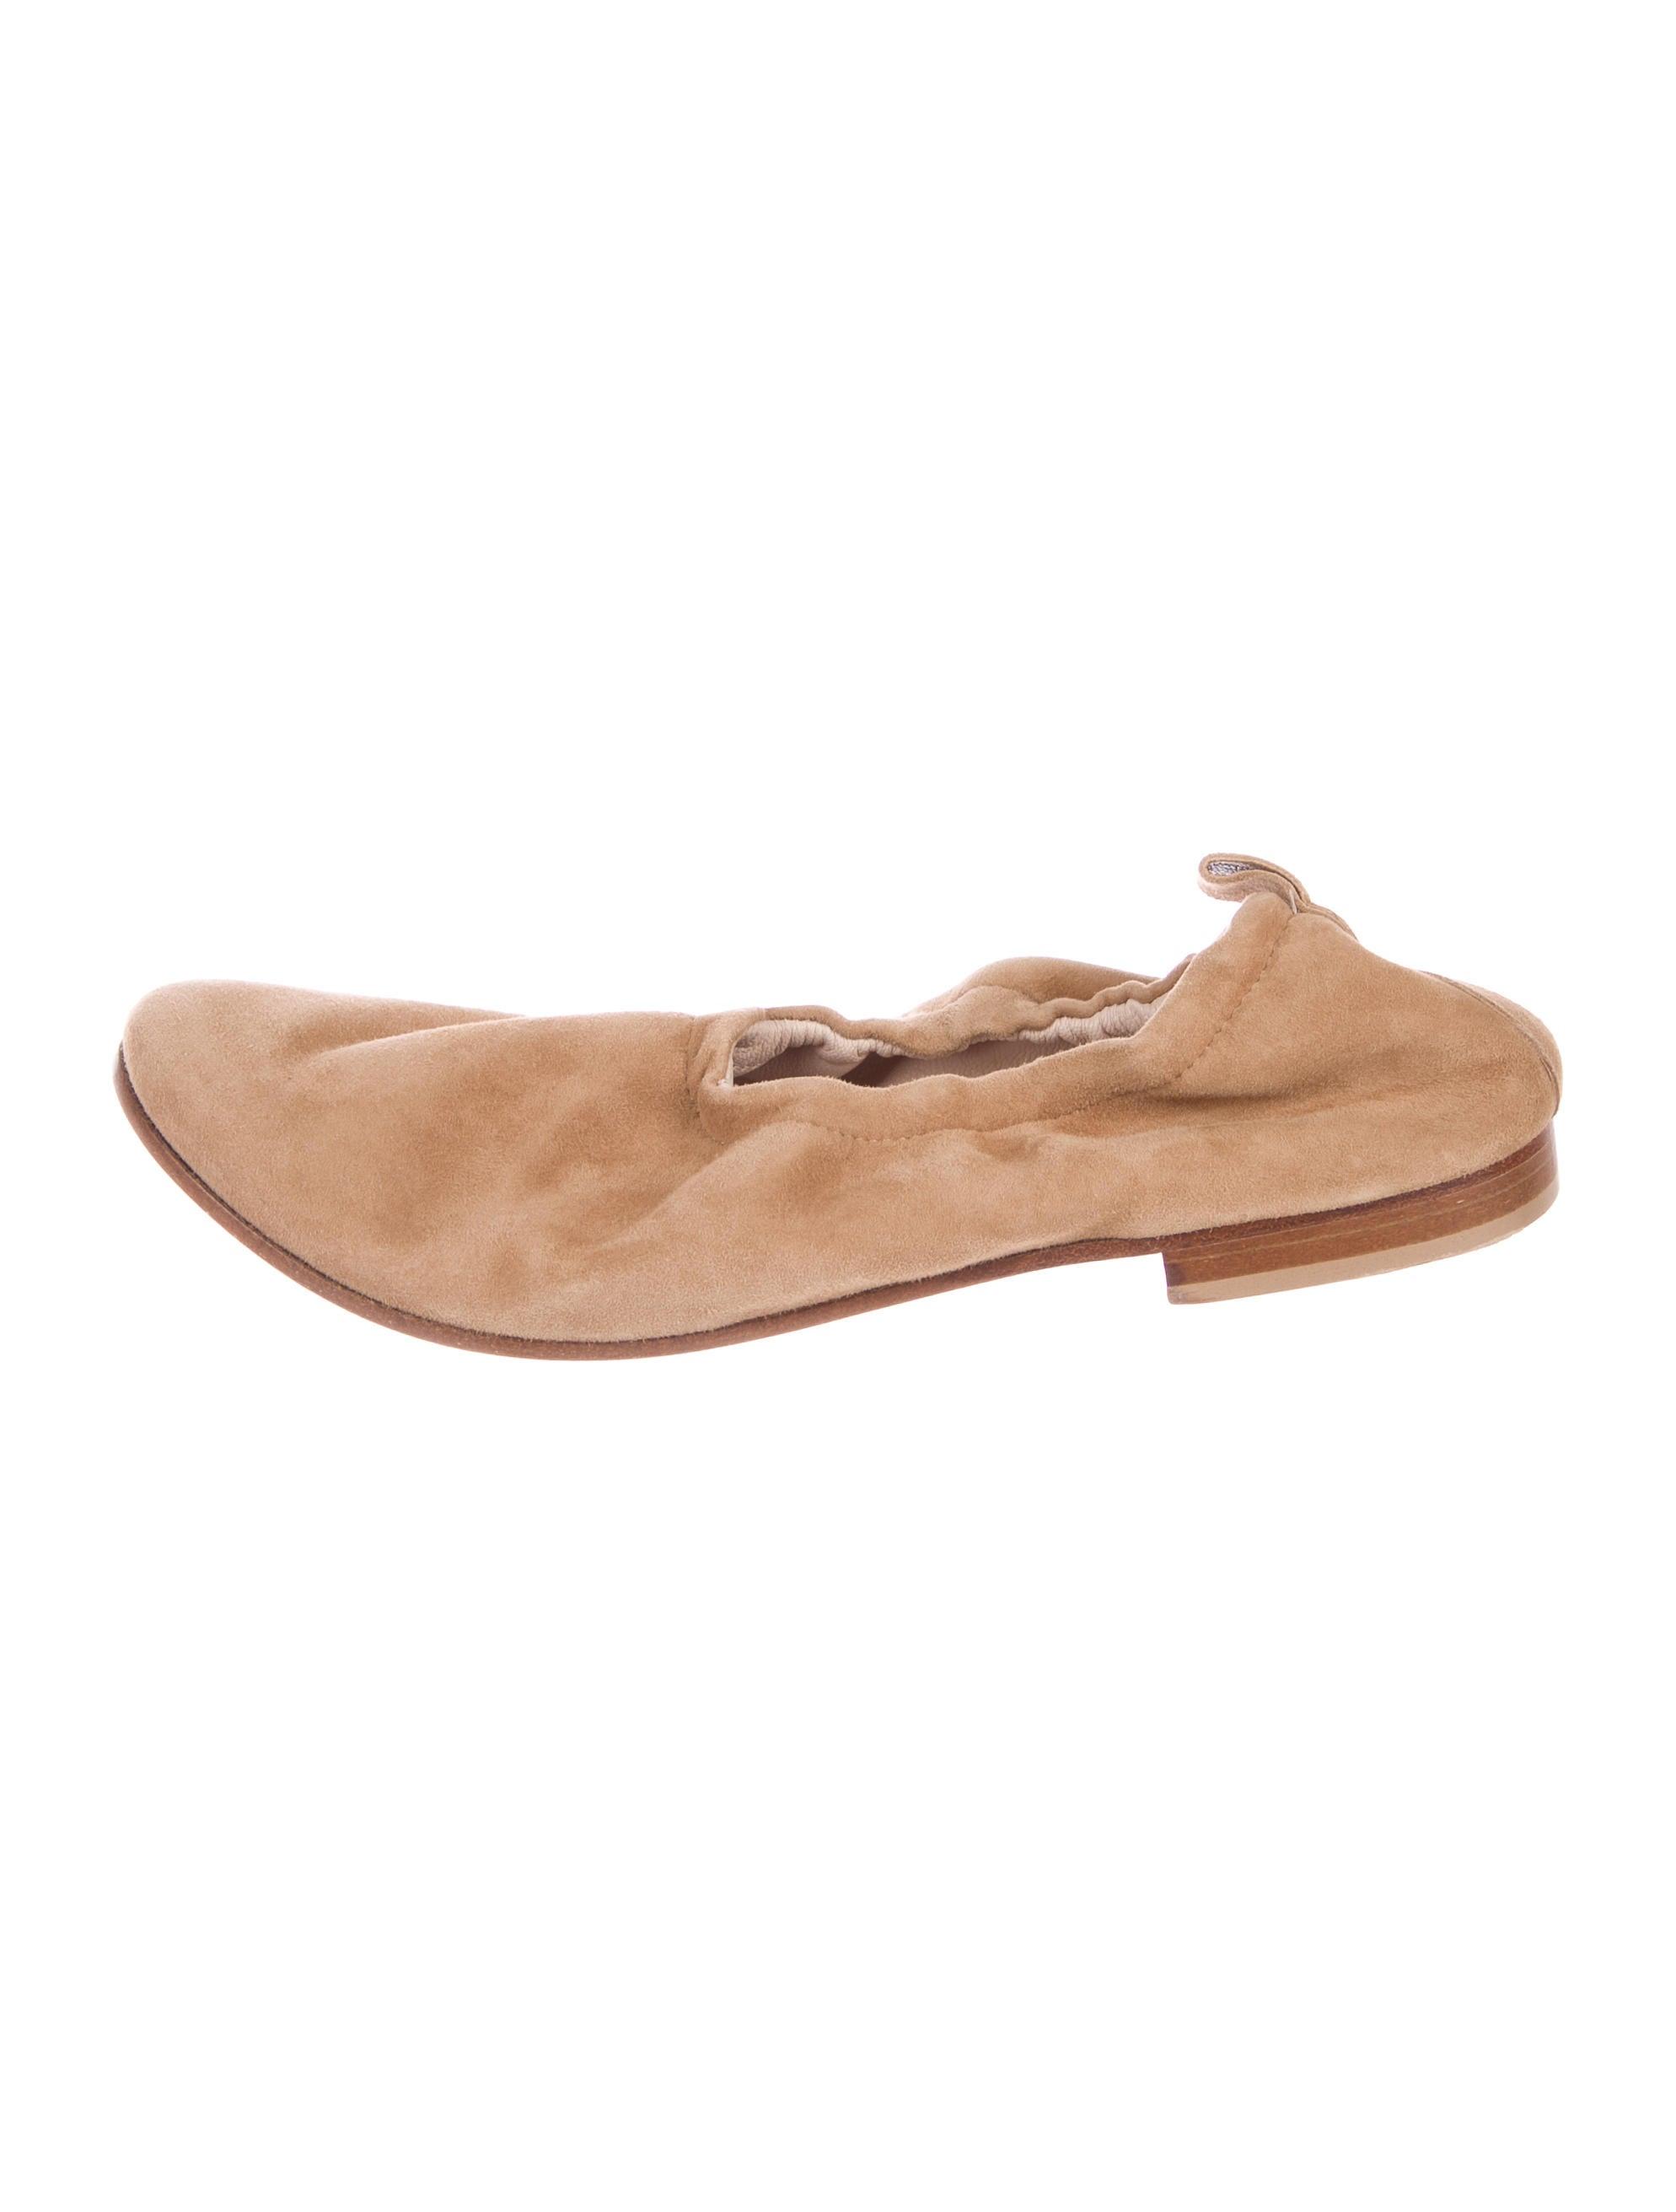 buy cheap footlocker finishline Aska Suede Round-Toe Flats free shipping amazon cheap hot sale e1NQgg